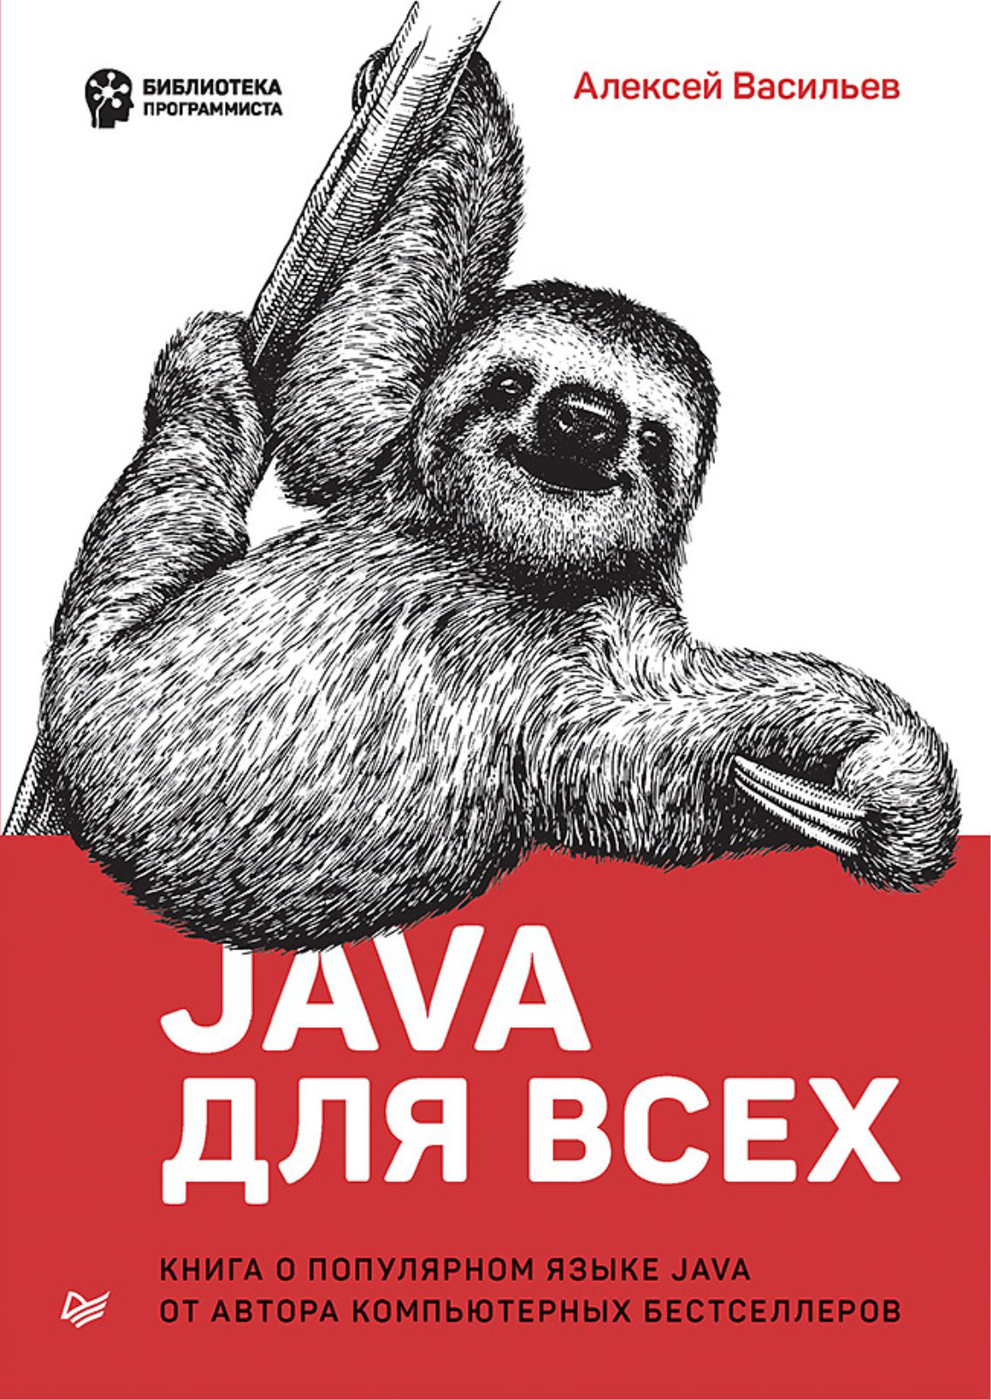 Java для всех | Васильев Алексей Николаевич